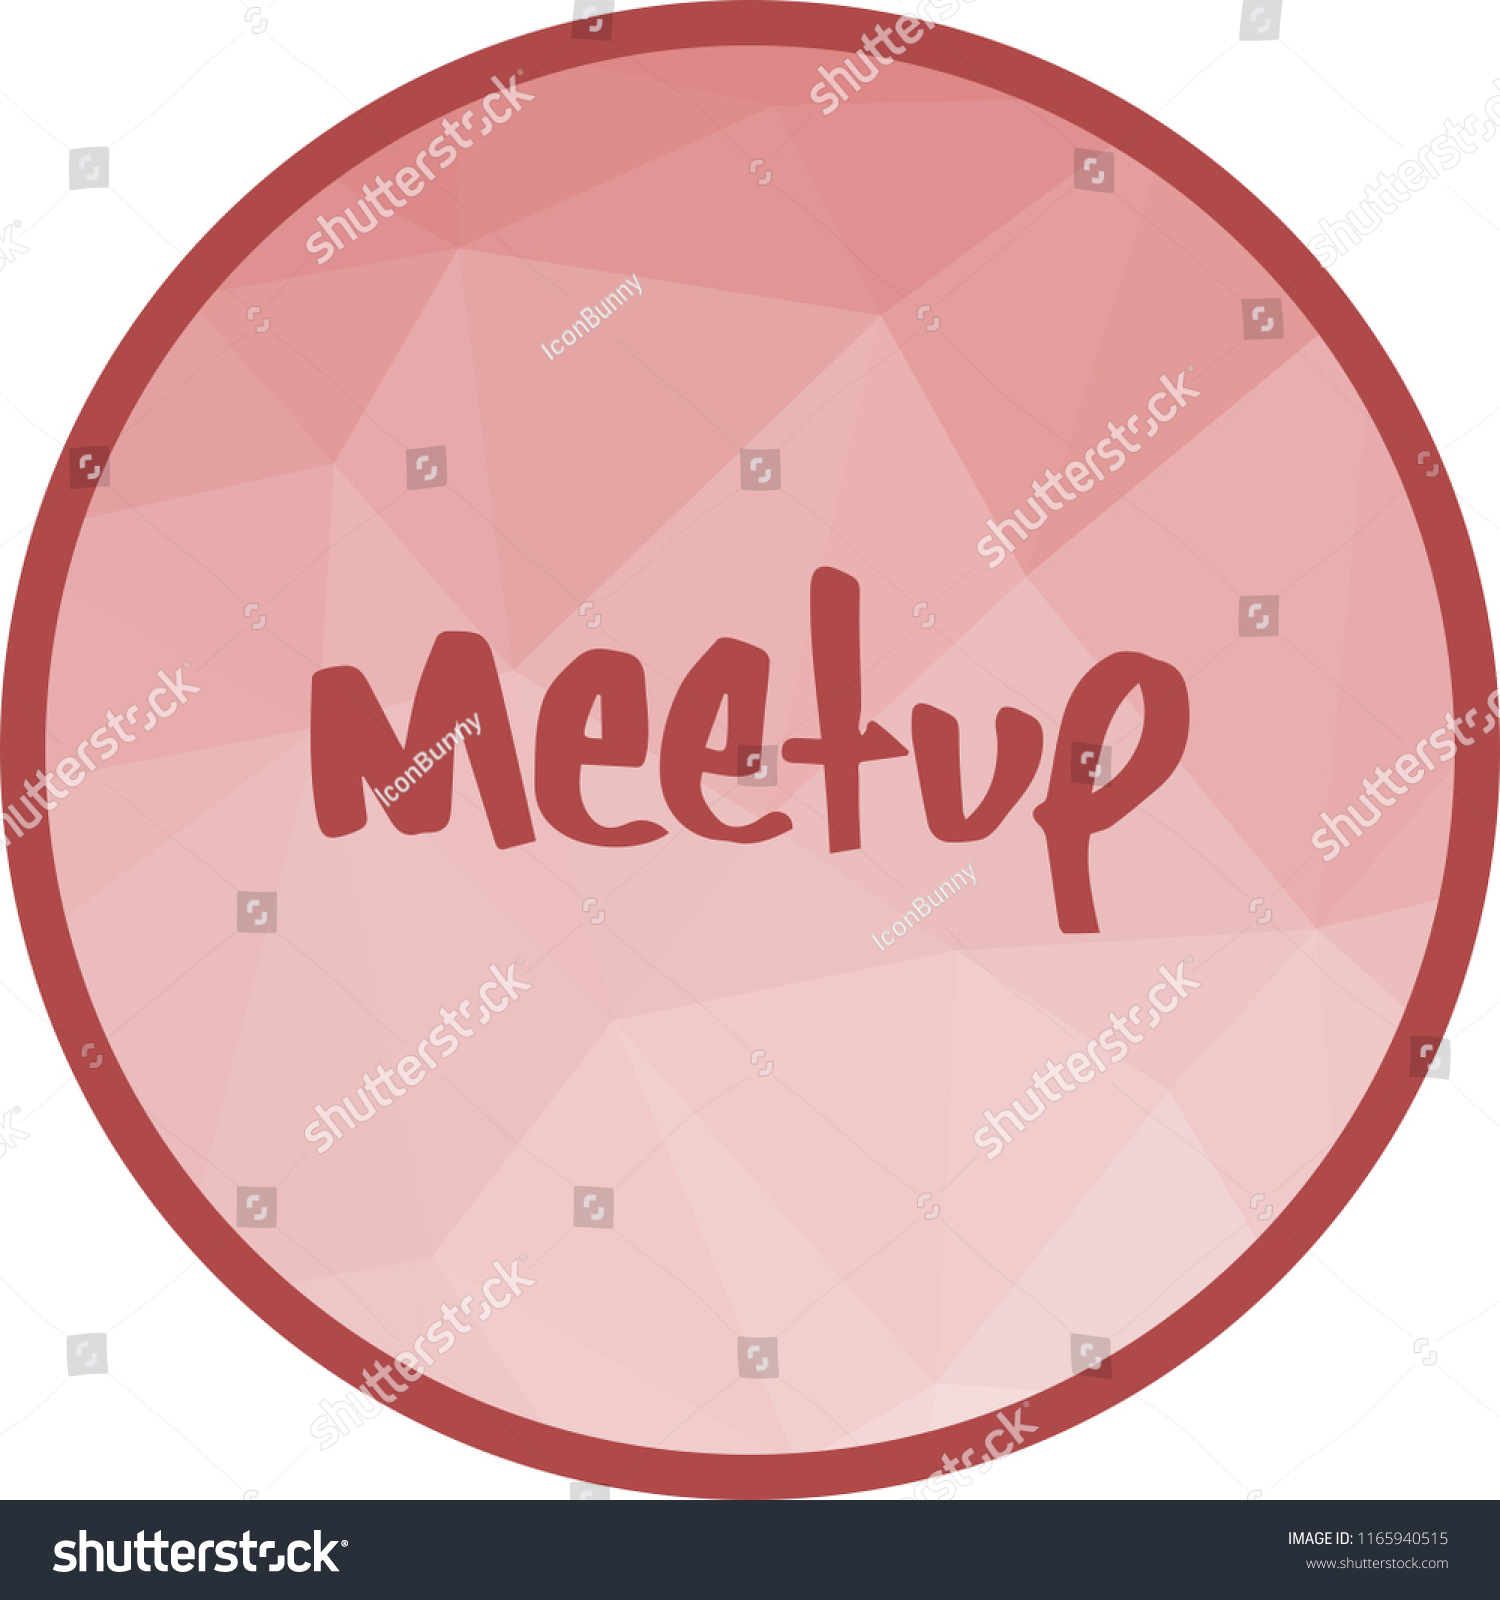 image shutterstock com/z/stock-vector-meetup-group